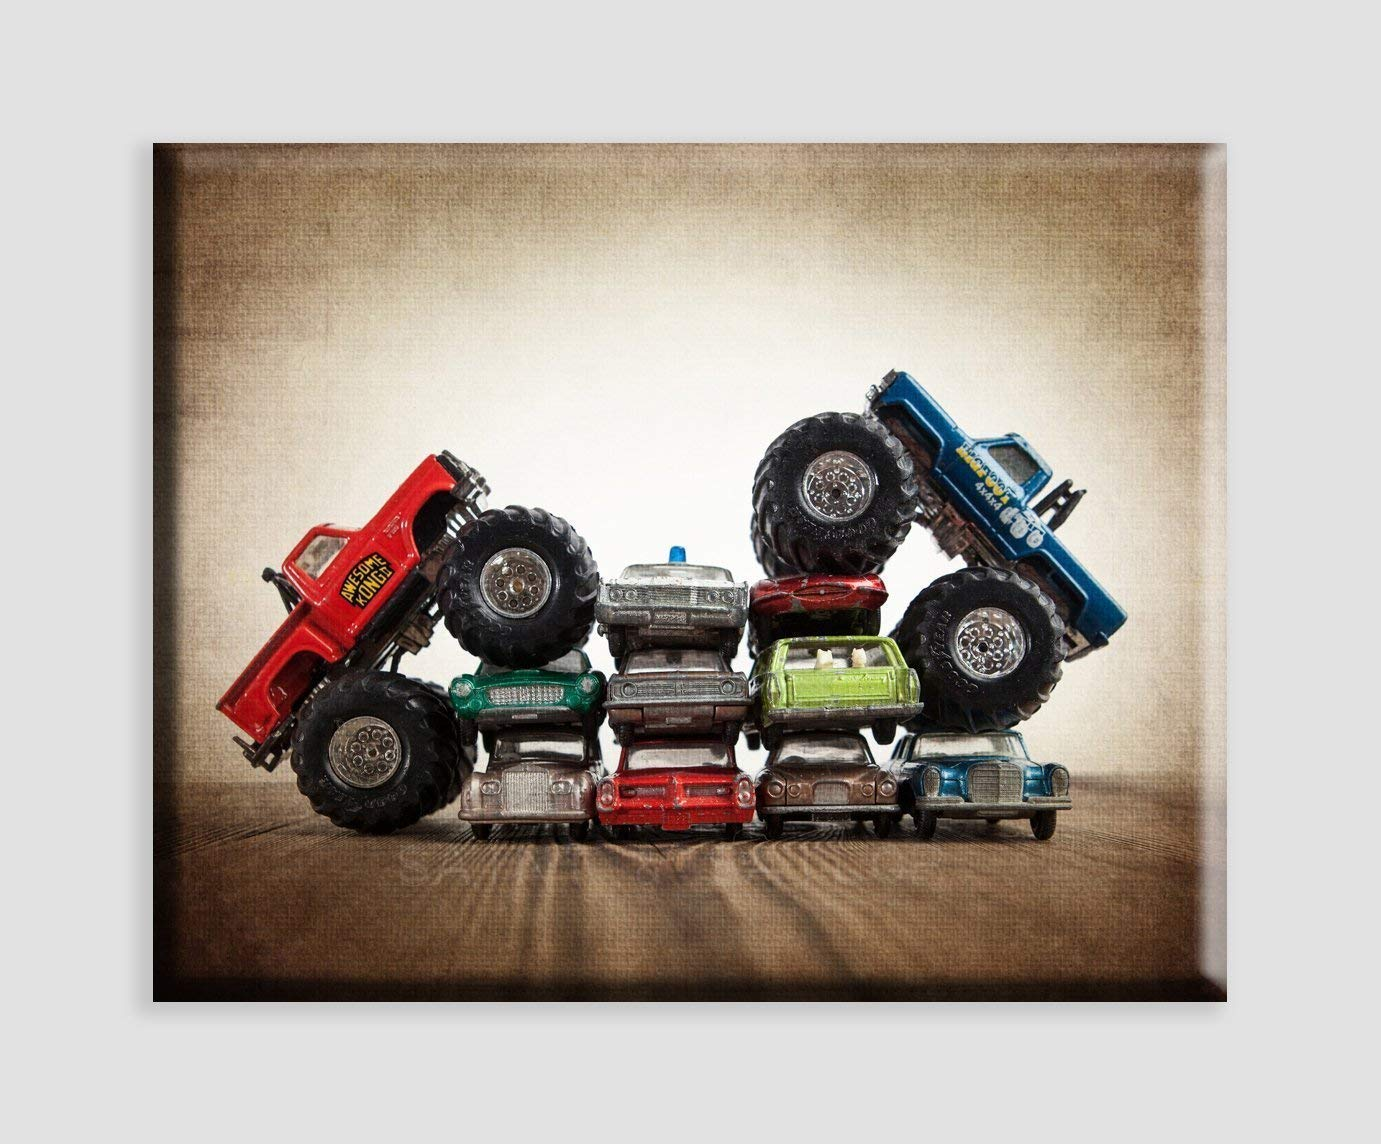 Vintage Monster Truck Art on Canvas''Bigfoot vs. Awesome Kong Car Crush'', Boys room Wall art, Photo Decor, Monster truck room, Nursery decor, Kids Room Wall Art.